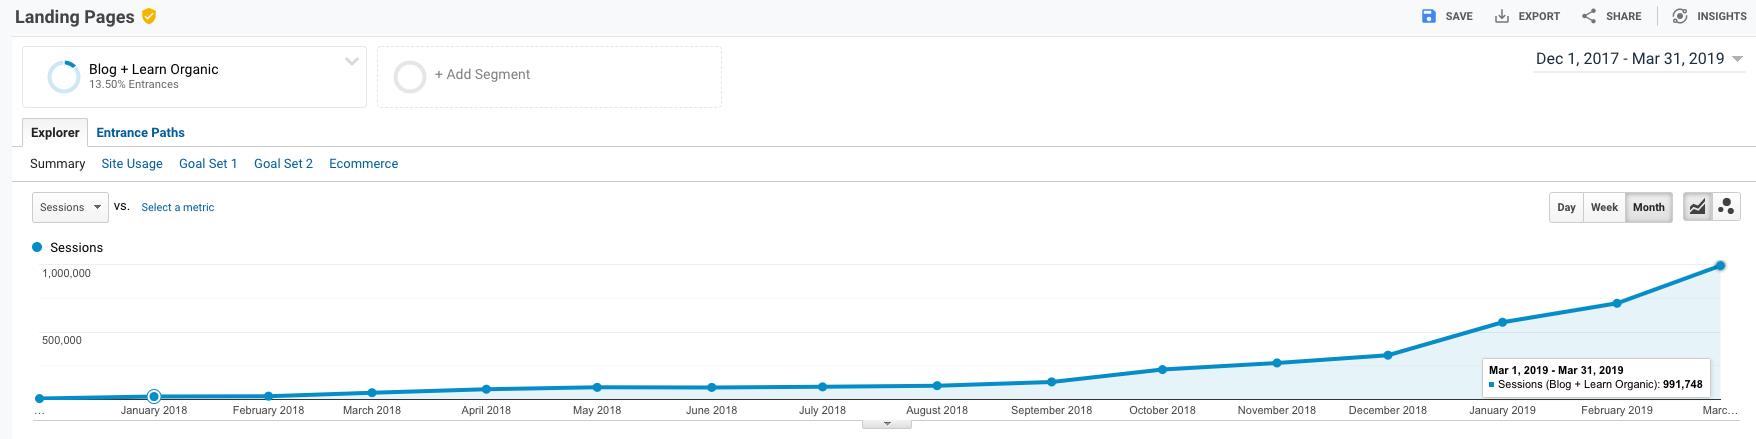 Learn Organic Traffic Google Analytics